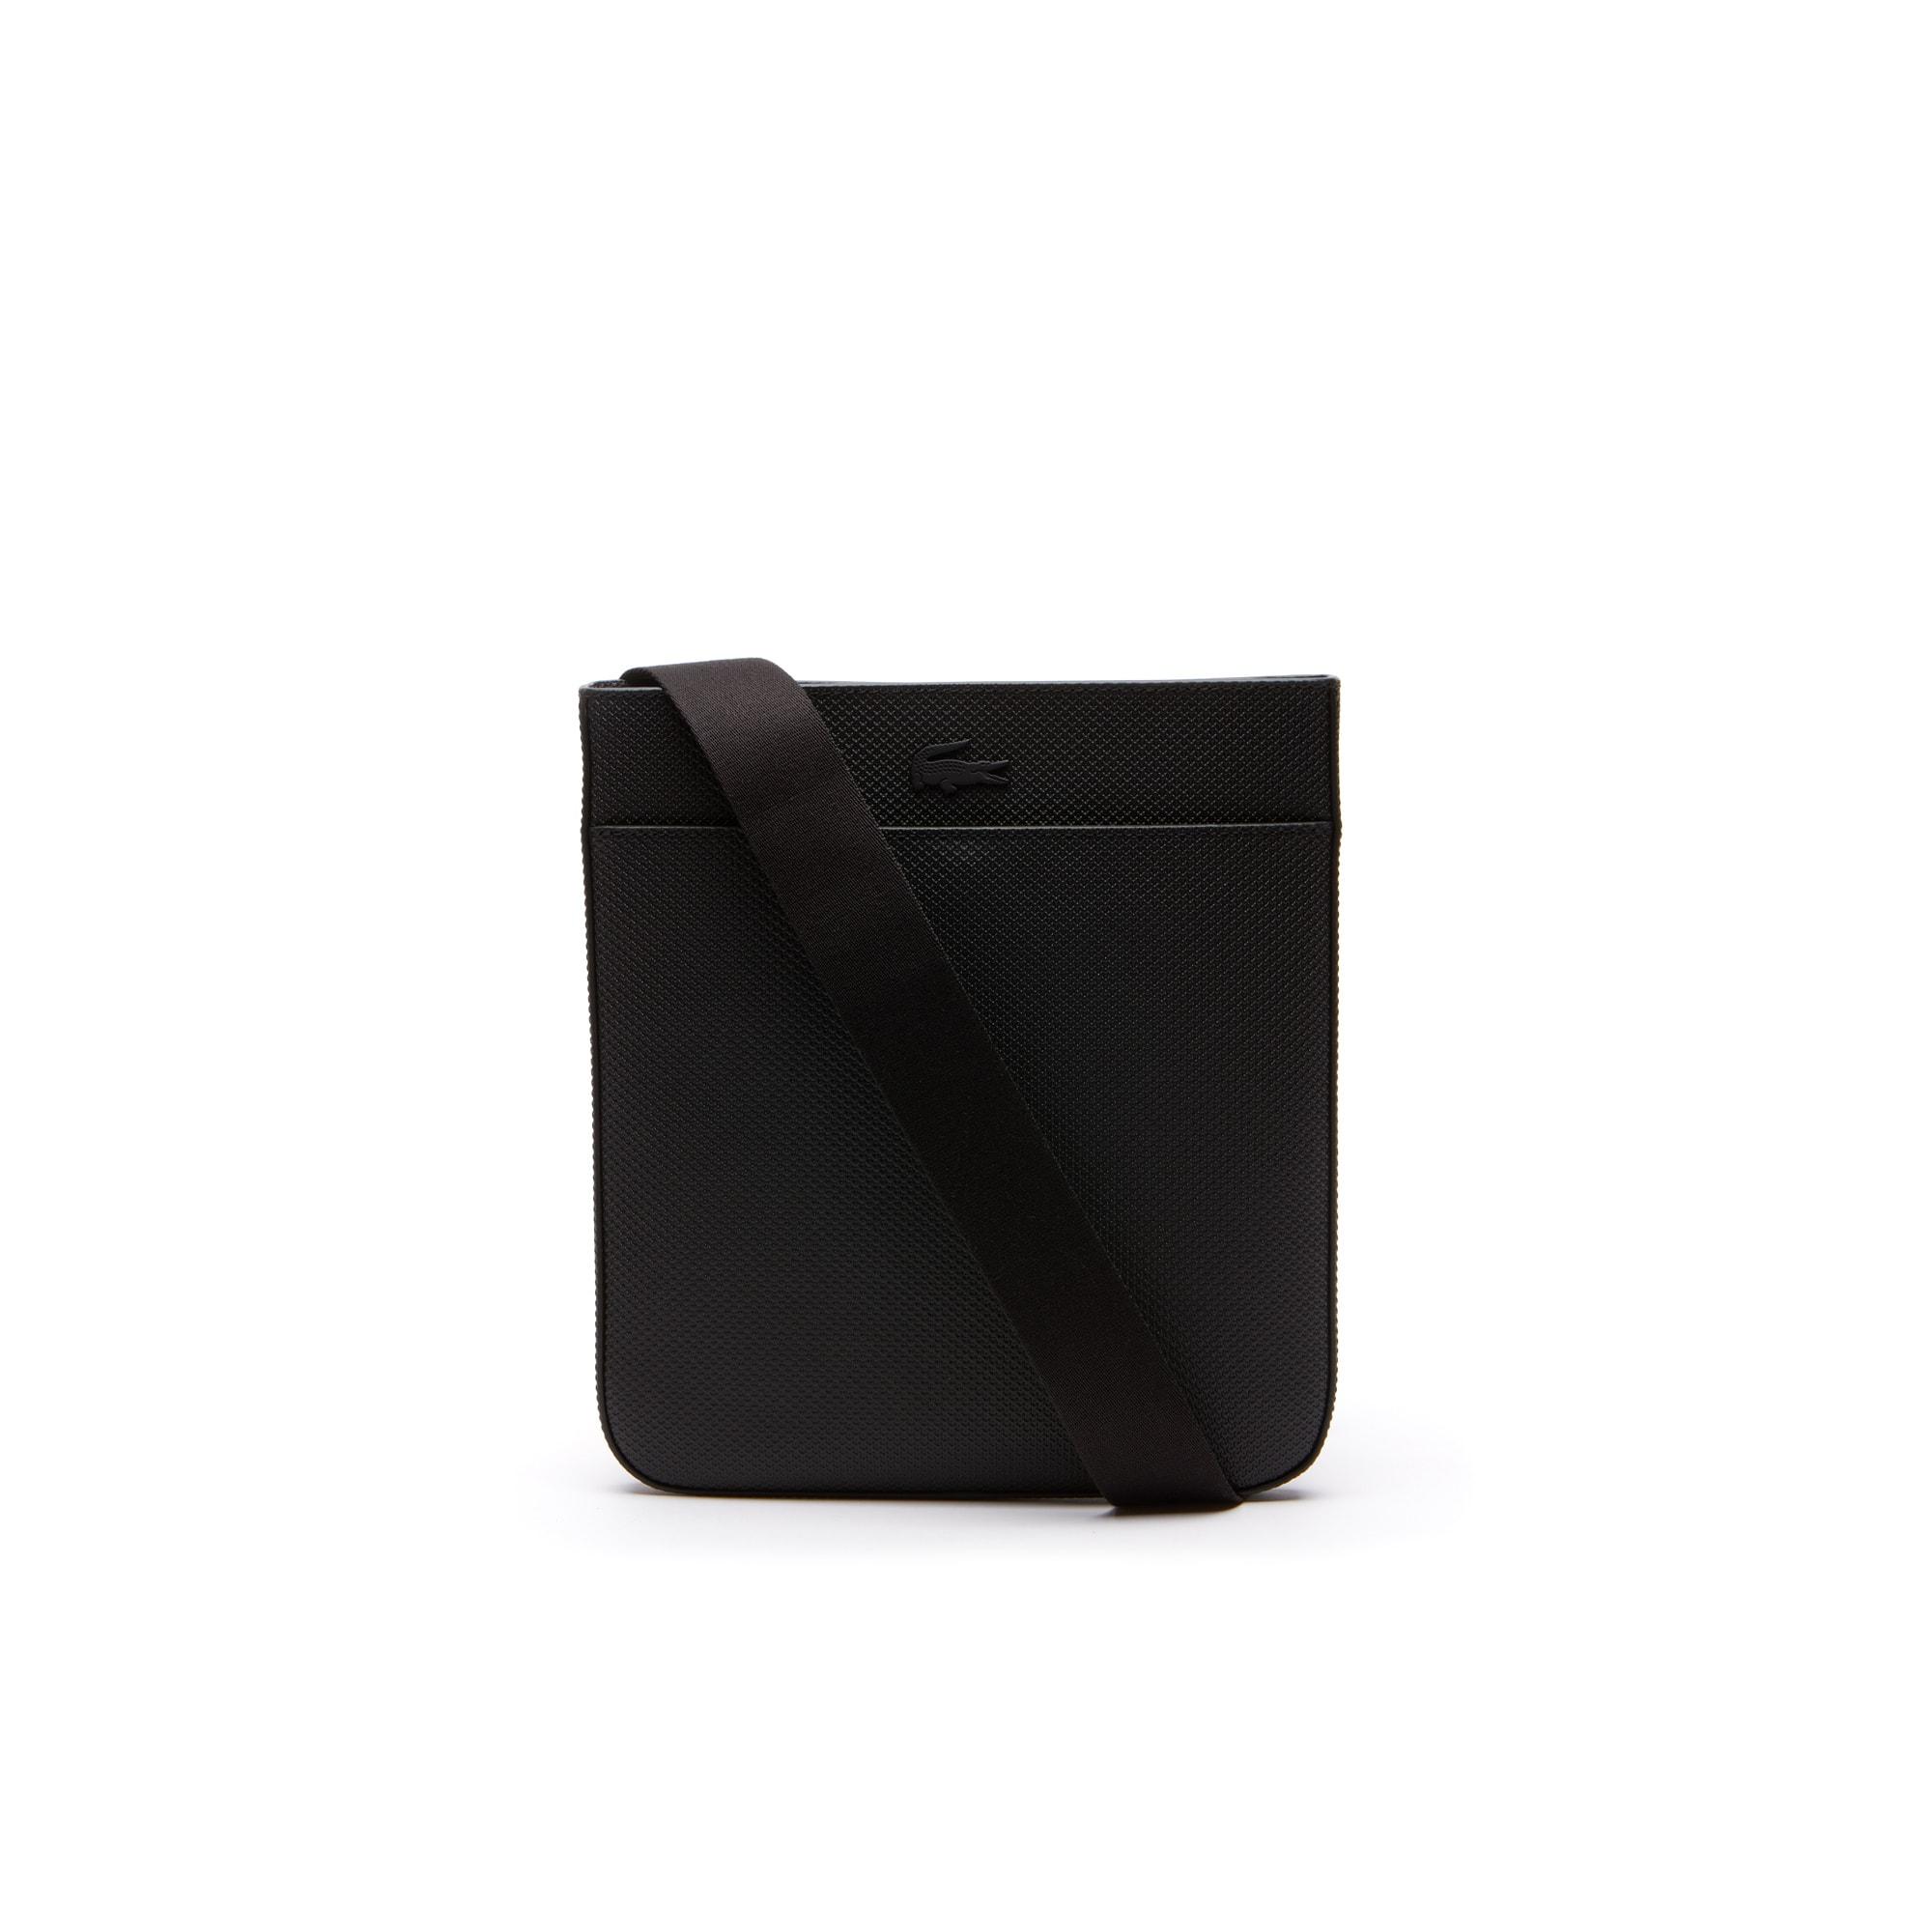 Herren CHANTACO Ledertasche aus mattem Piqué-Leder